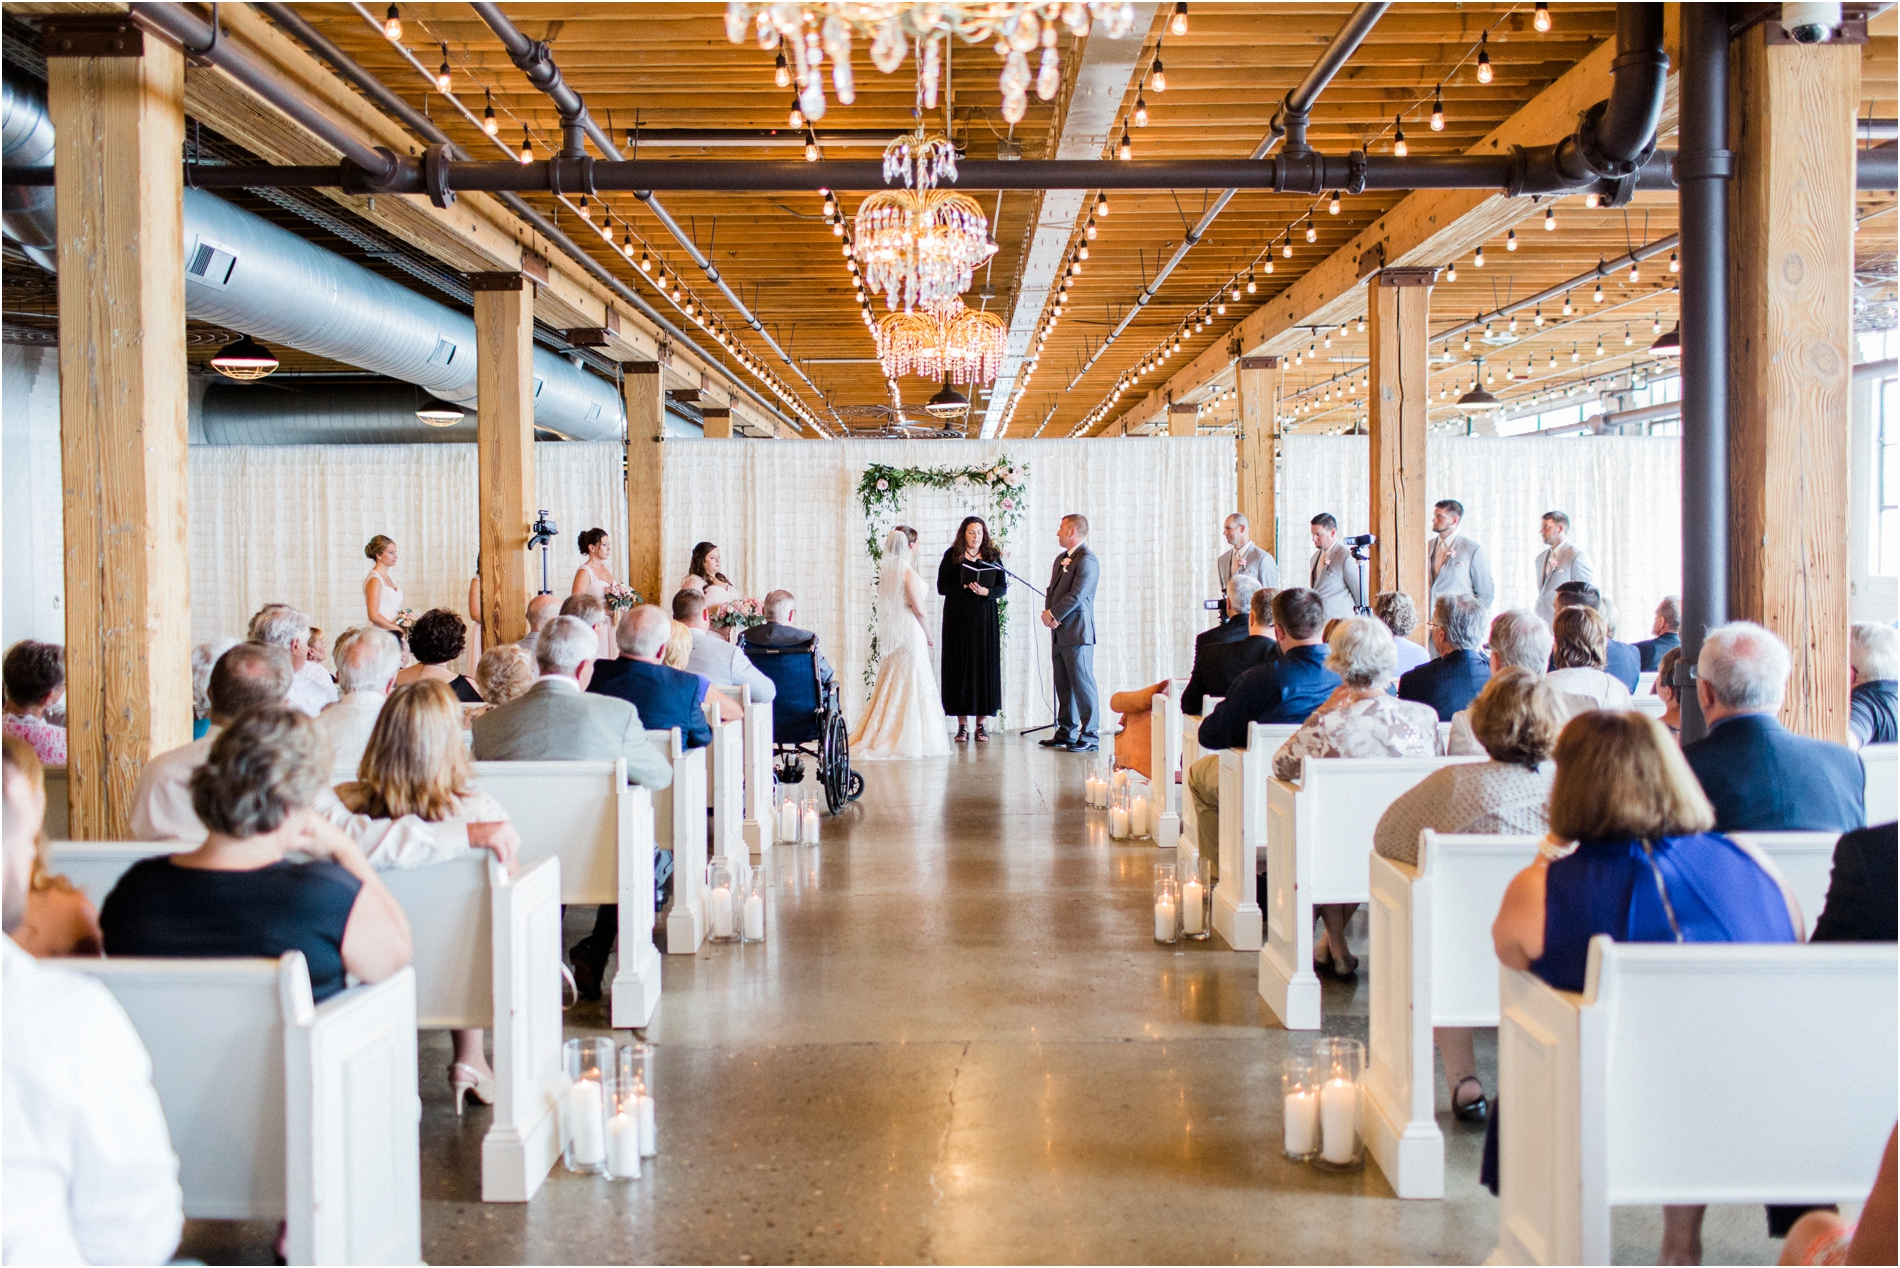 Joe Becky The Cheney Place Wedding Posh Petals Grand Rapids Fancy Fray By Tifani Lyn Photography 0040